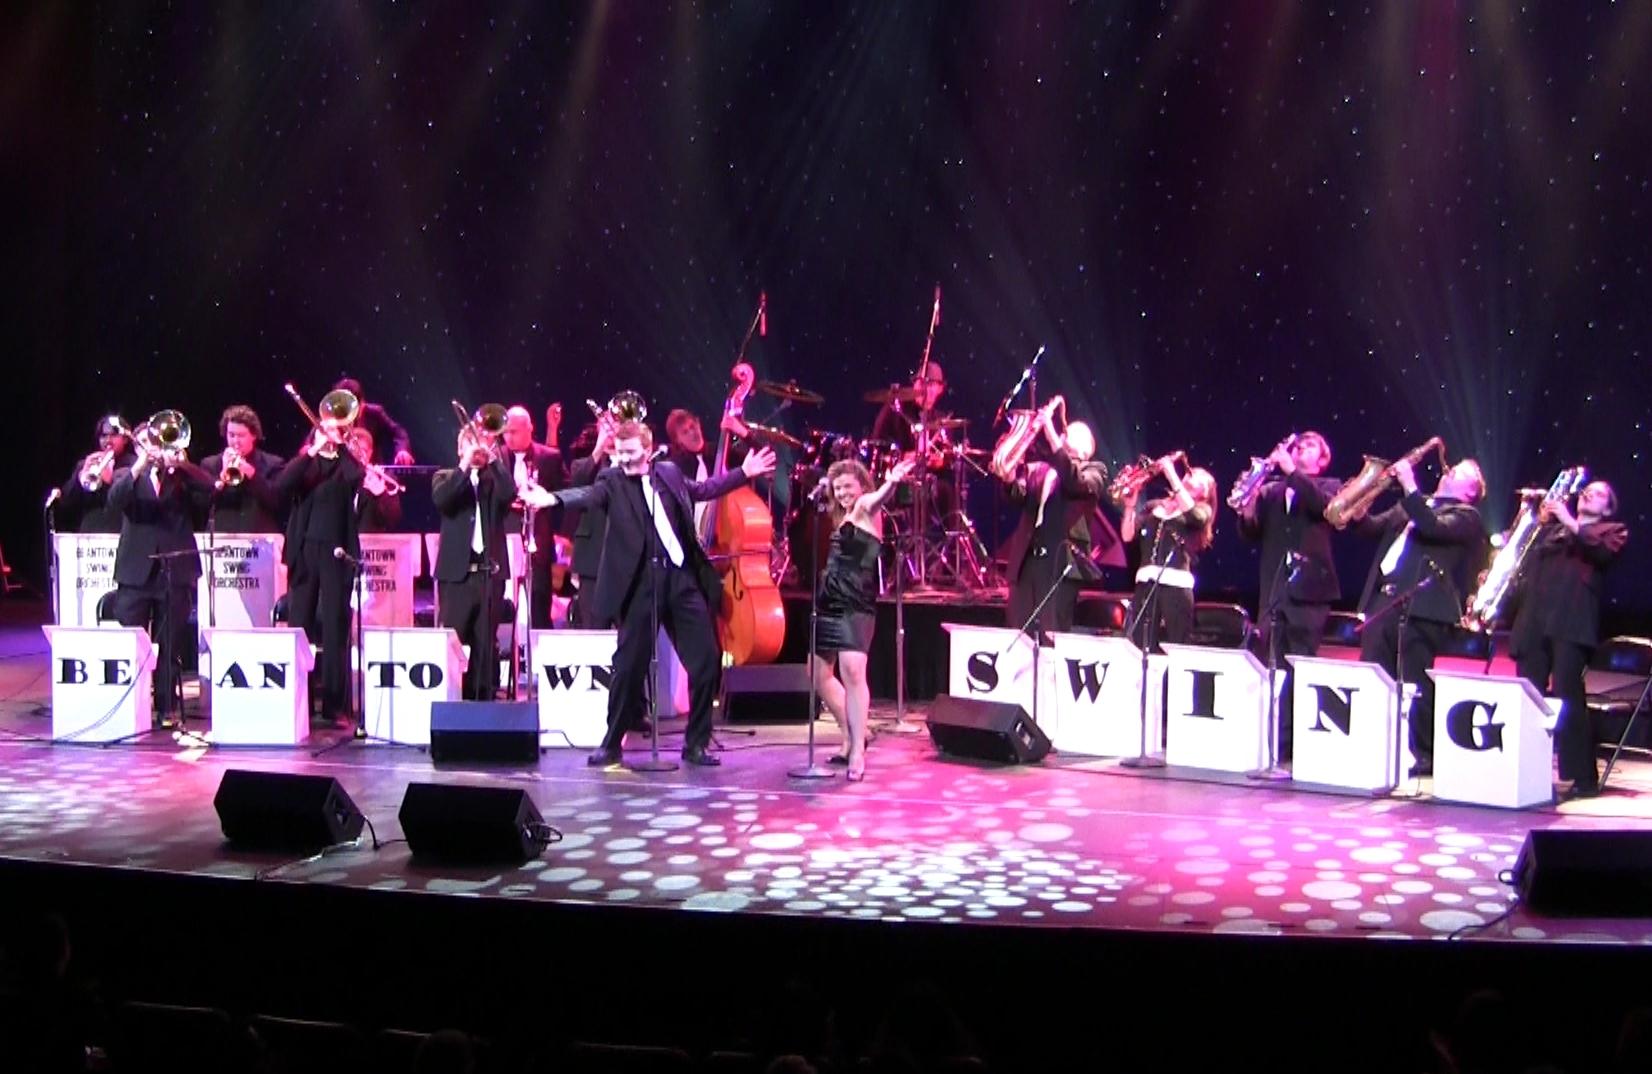 Beantown Swing Orchestra Wikipedia